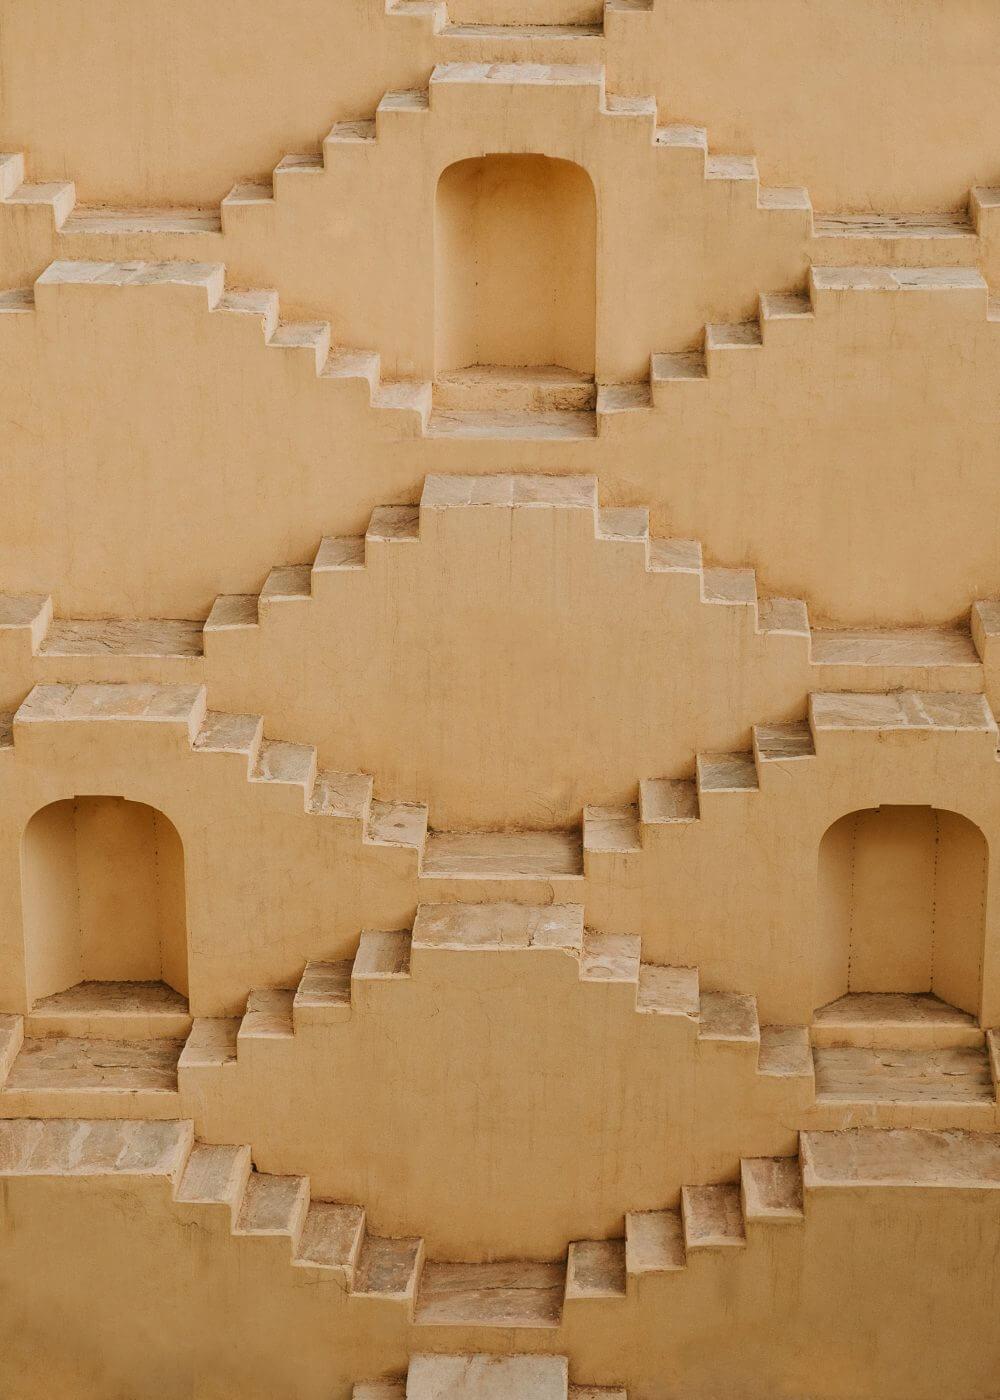 Panna Meena ka Kund, Jaipur, India | Photography by Kayla Mendez